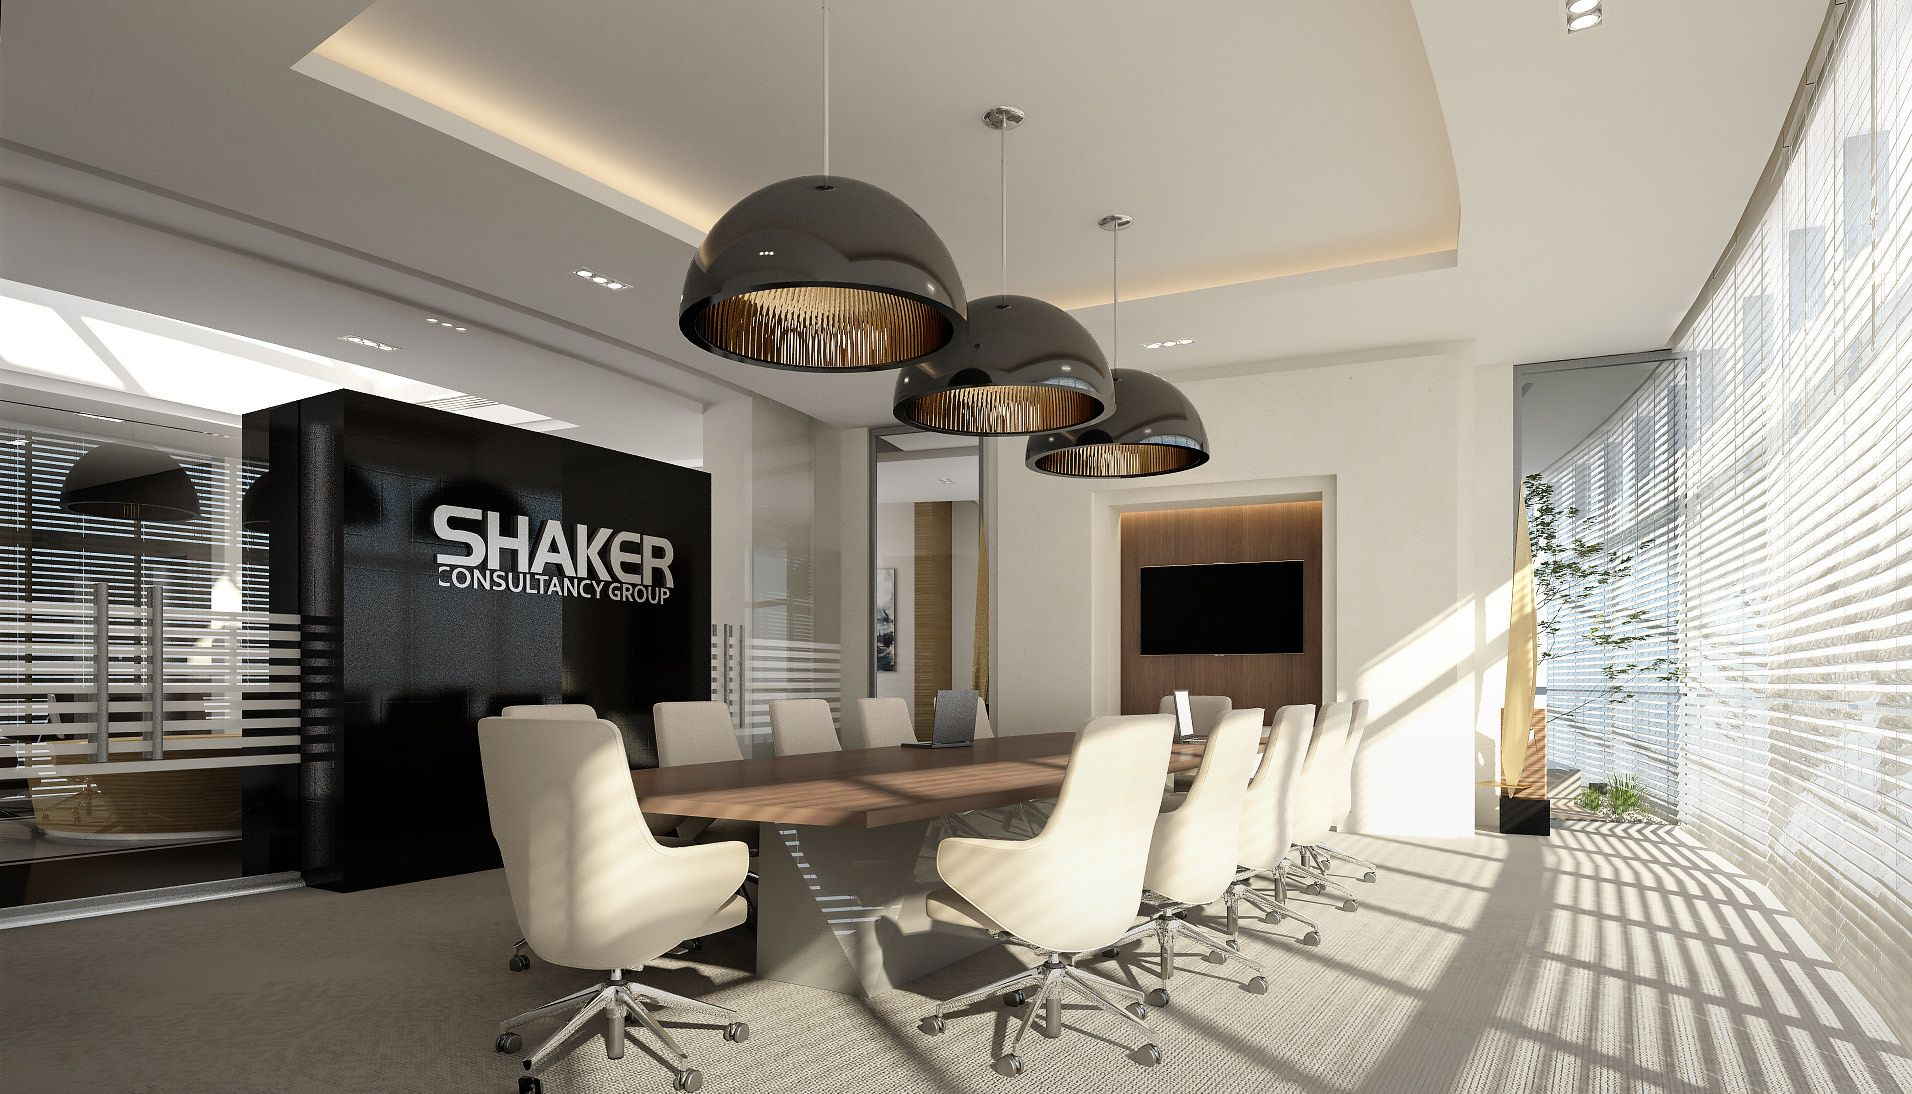 Mimar interiors dise o de interiores pinterest Despachos de diseno de interiores df